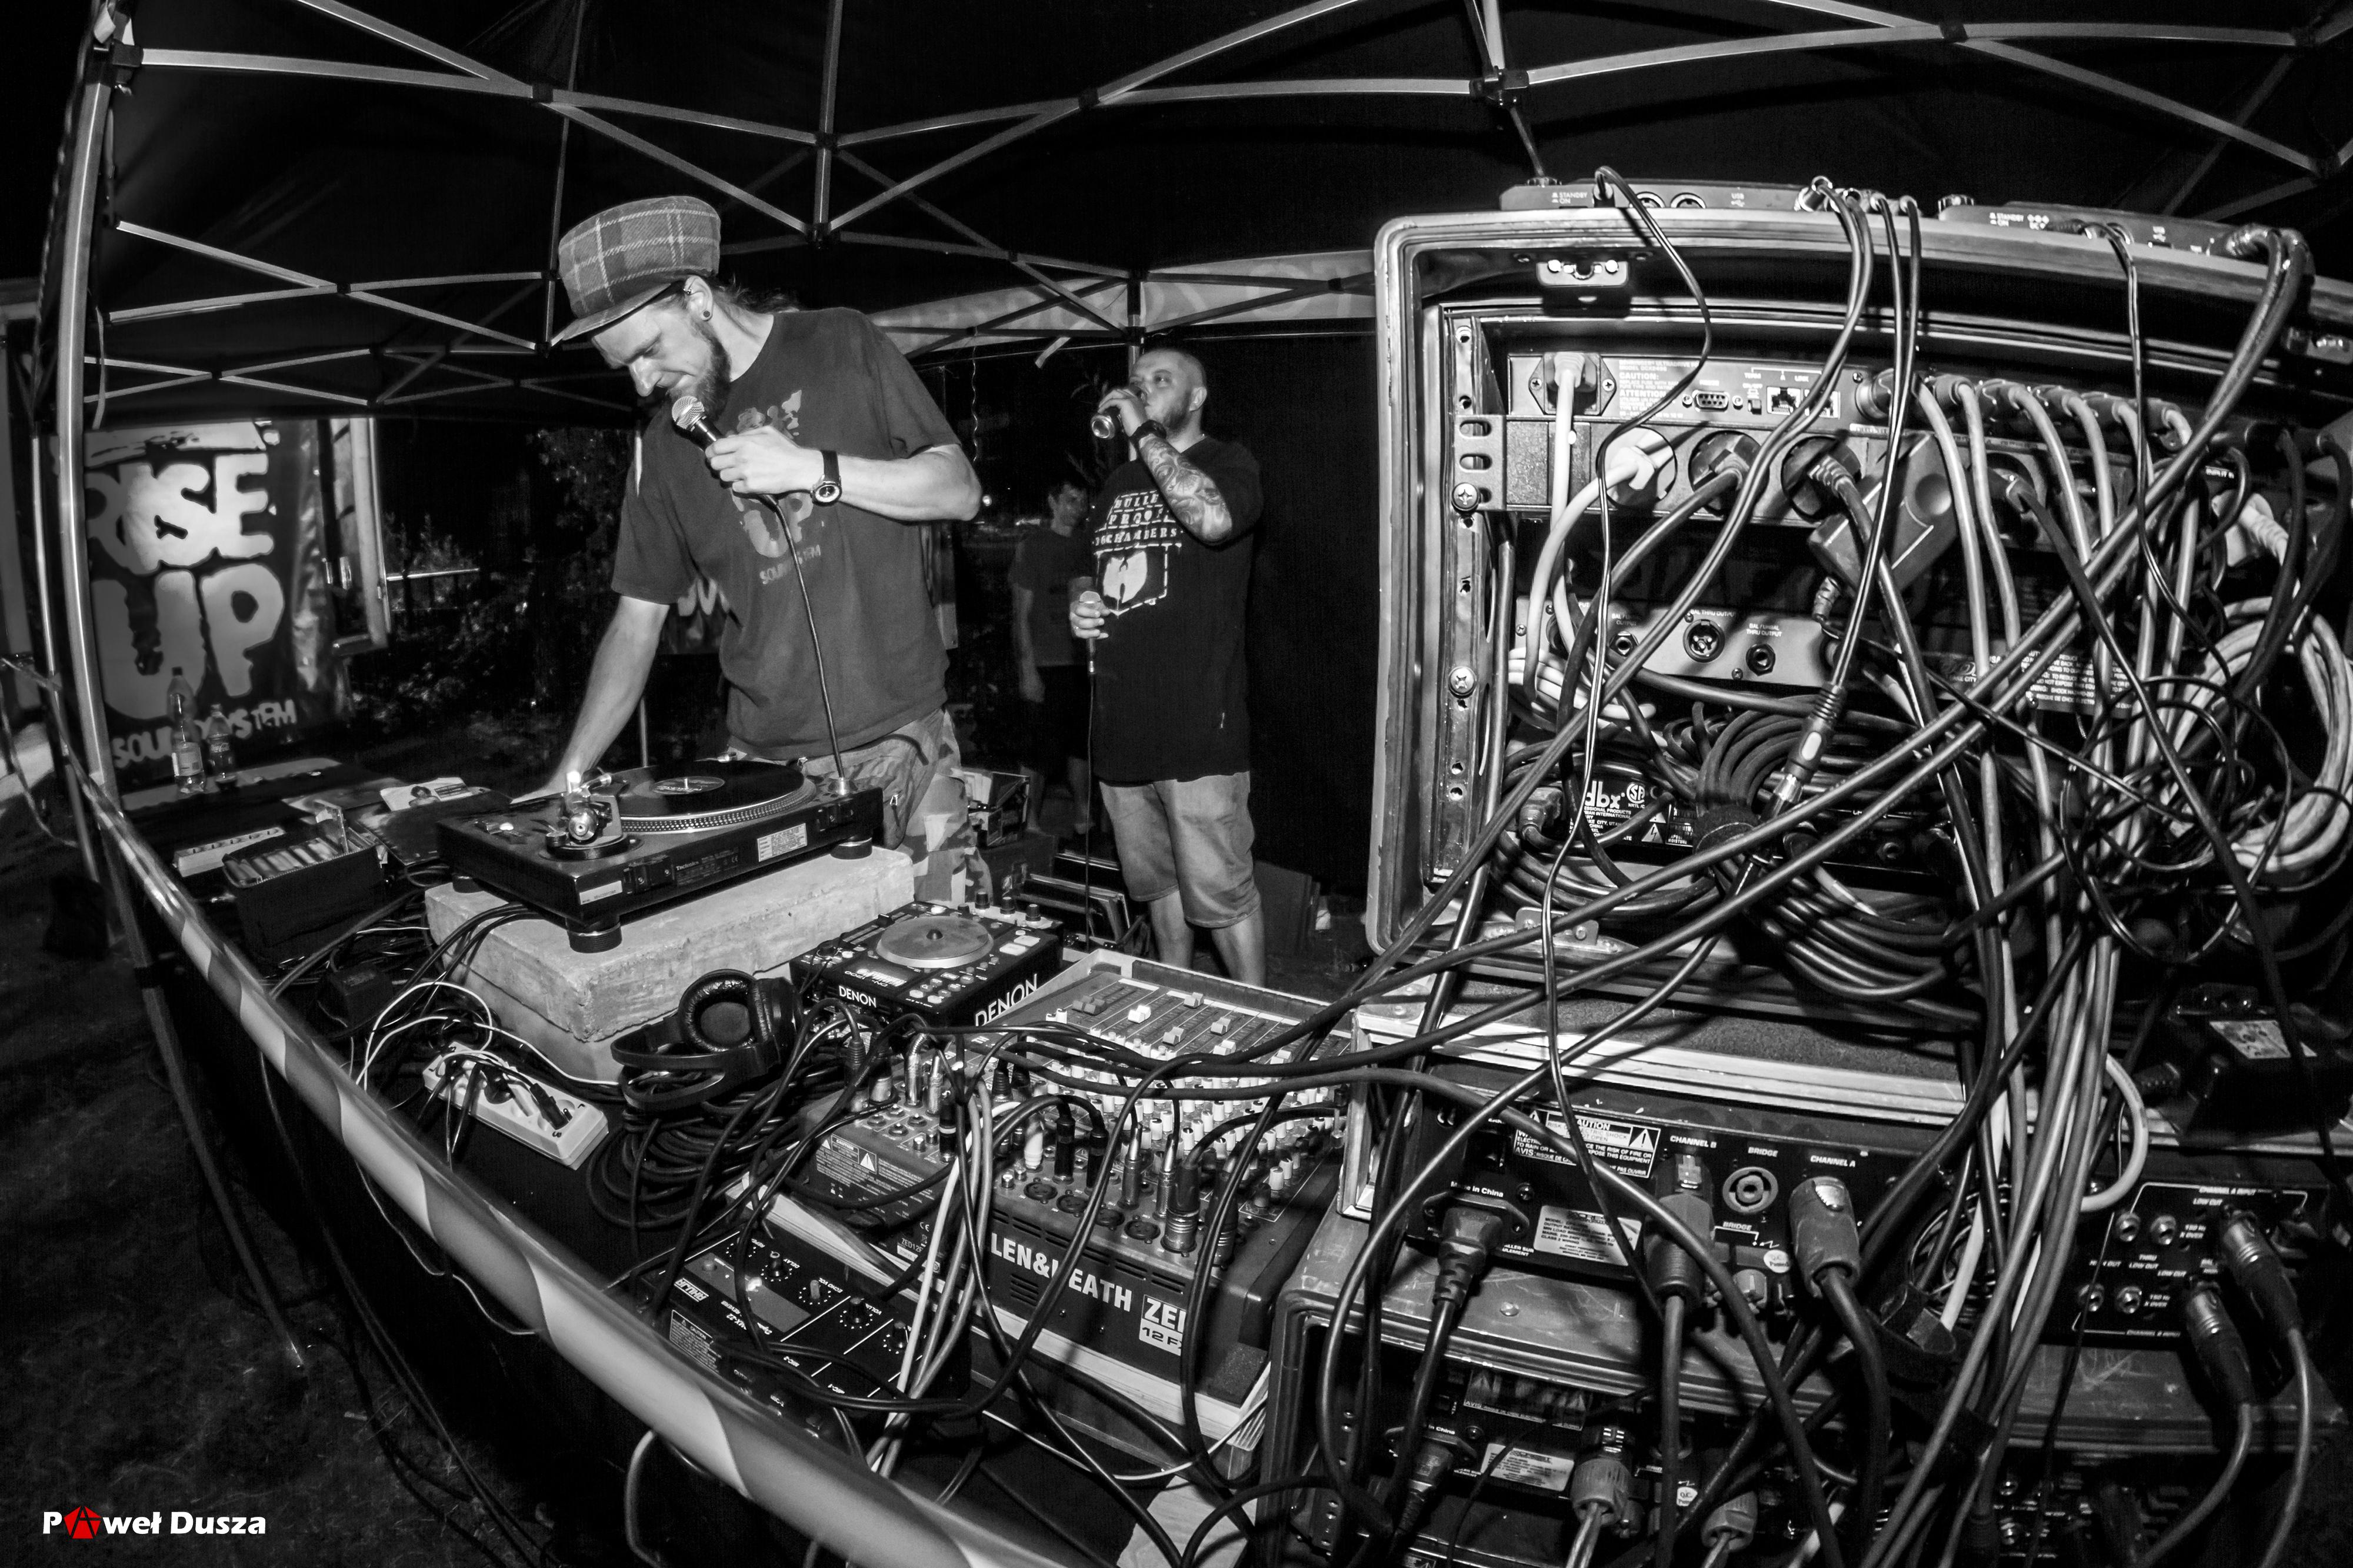 Paweł Dusza Photography_Soundsystem Street Festival 2018